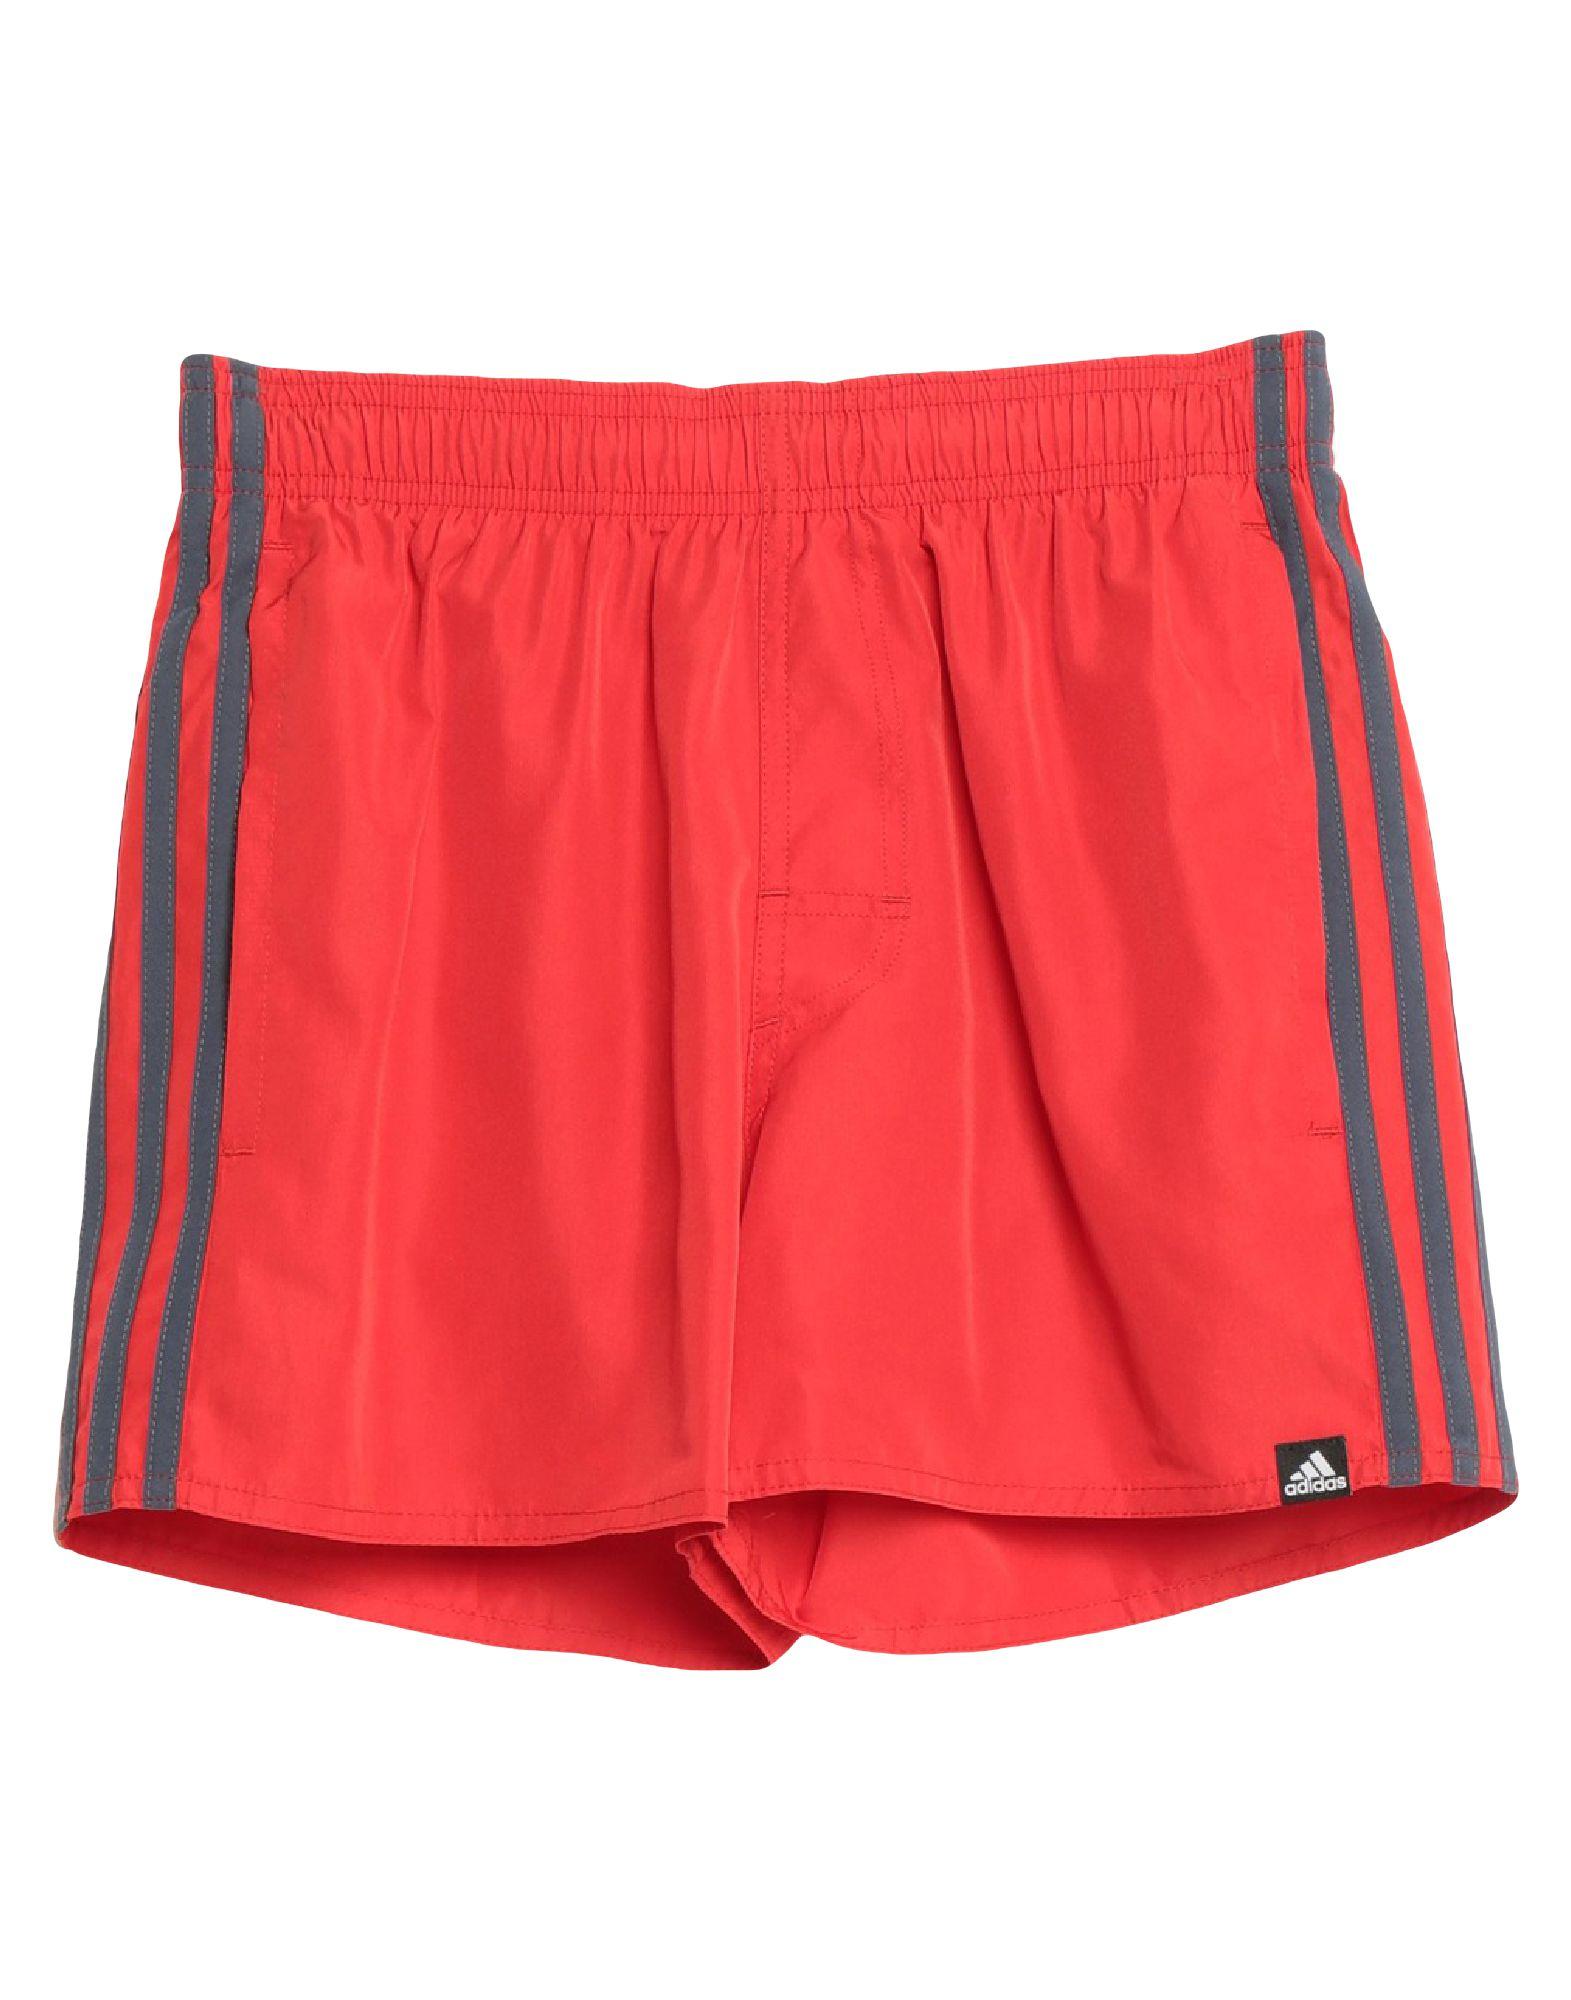 ADIDAS Swim trunks - Item 47266269